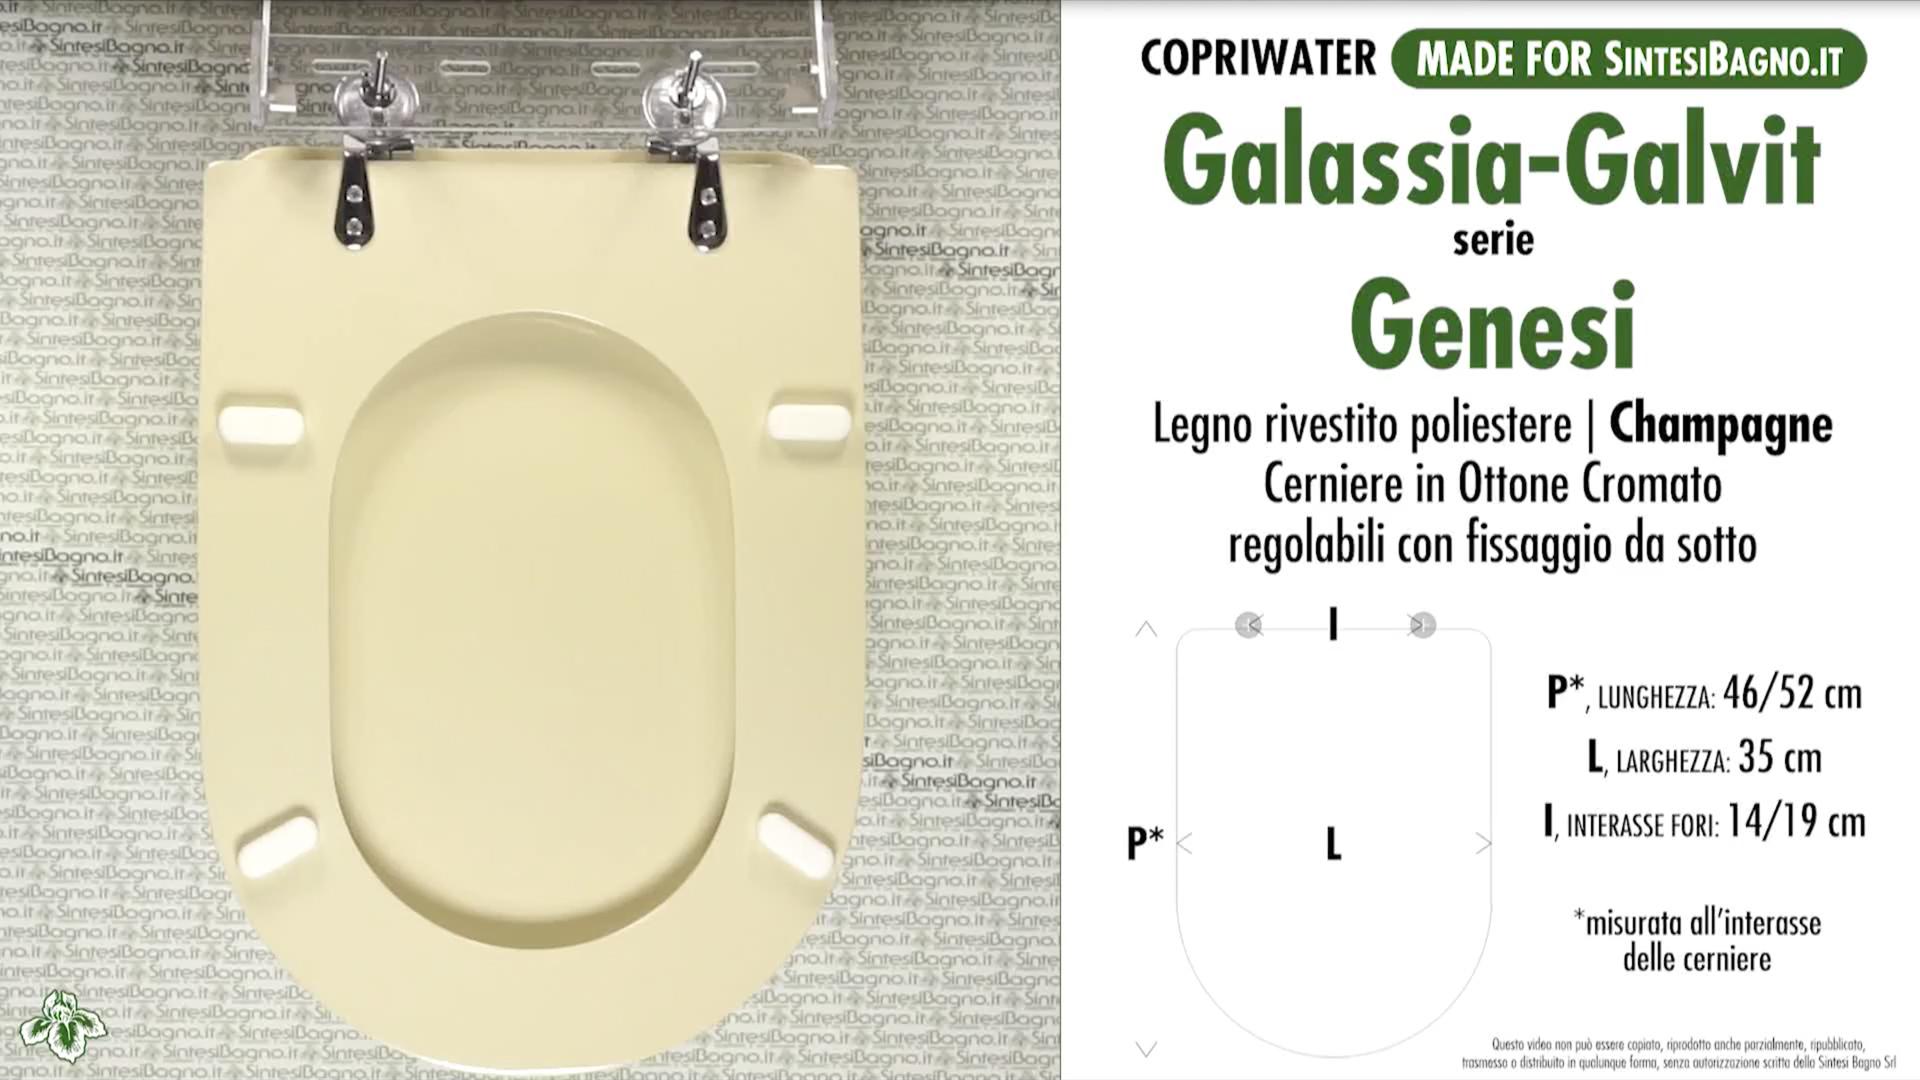 SCHEDA TECNICA MISURE copriwater GALASSIA-GALVIT GENESI